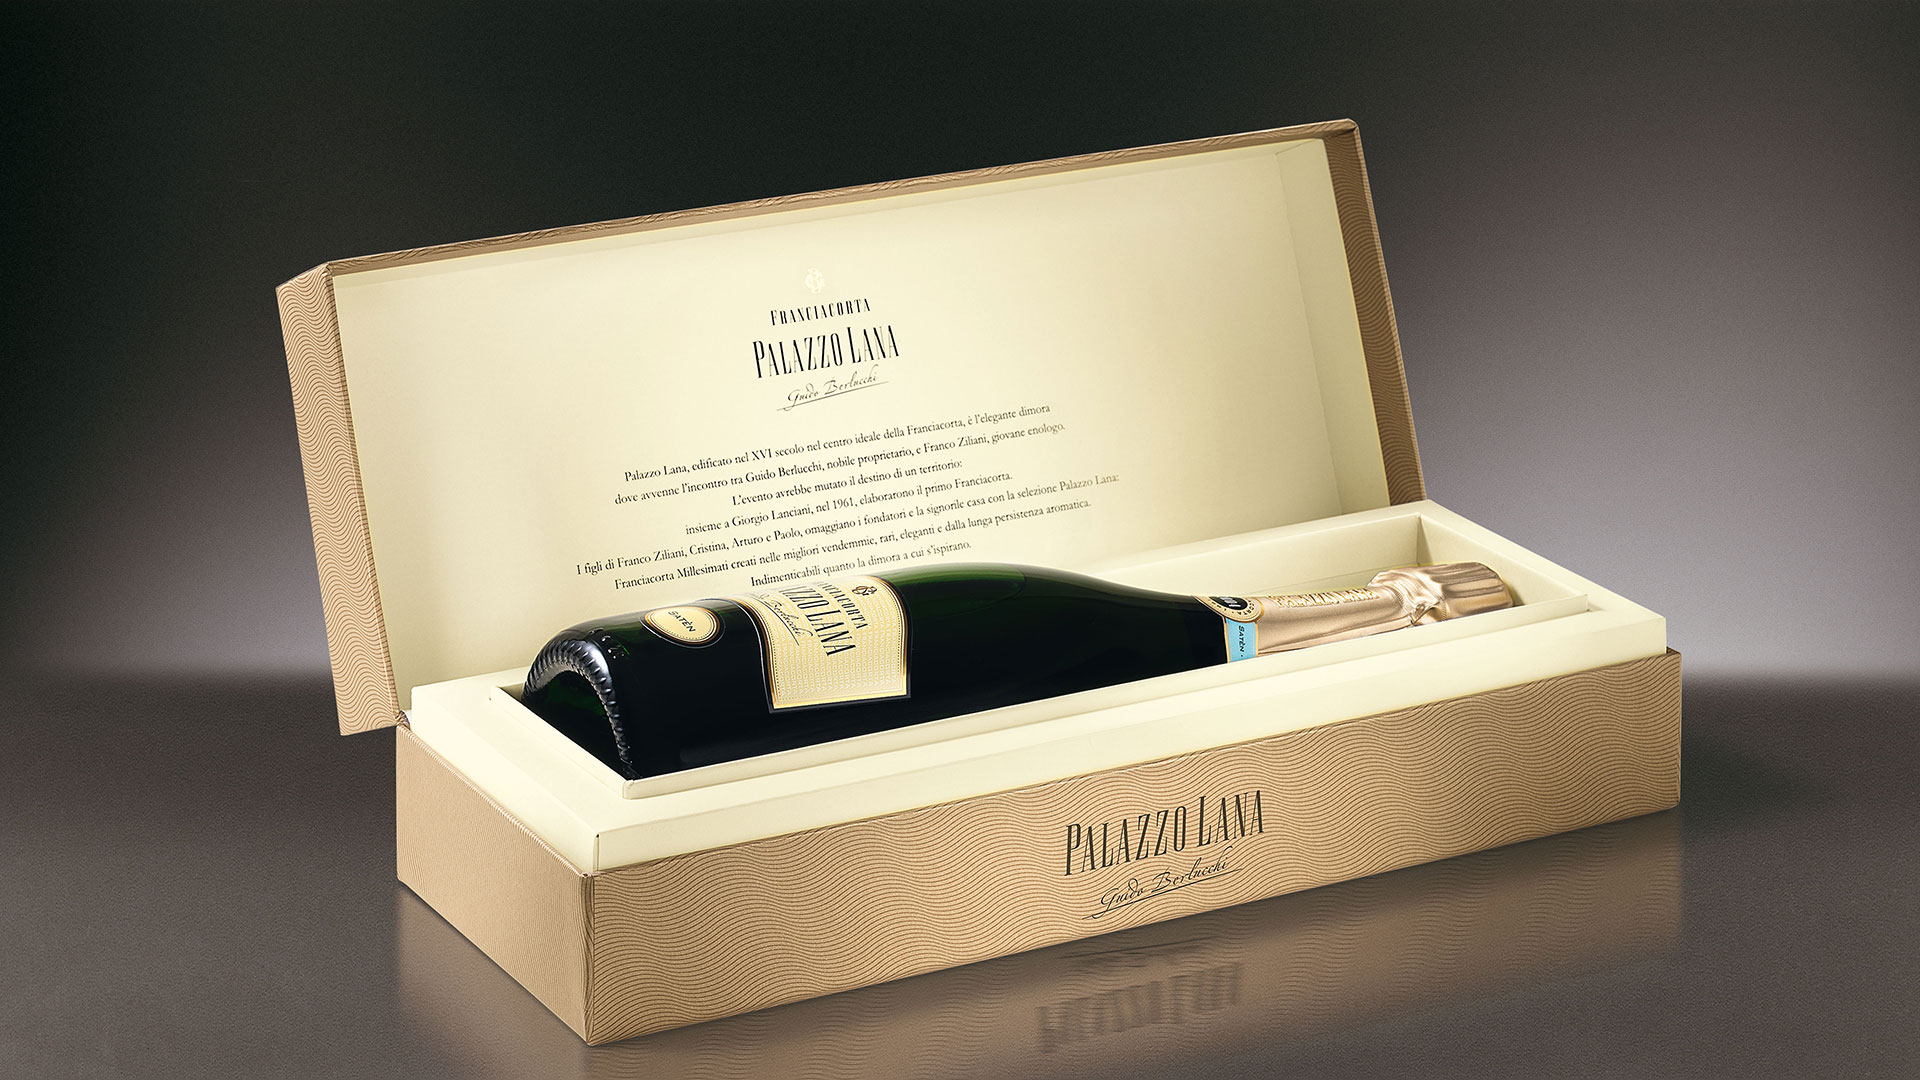 Guido Berlucchi secondary packaging Palazzo Lana